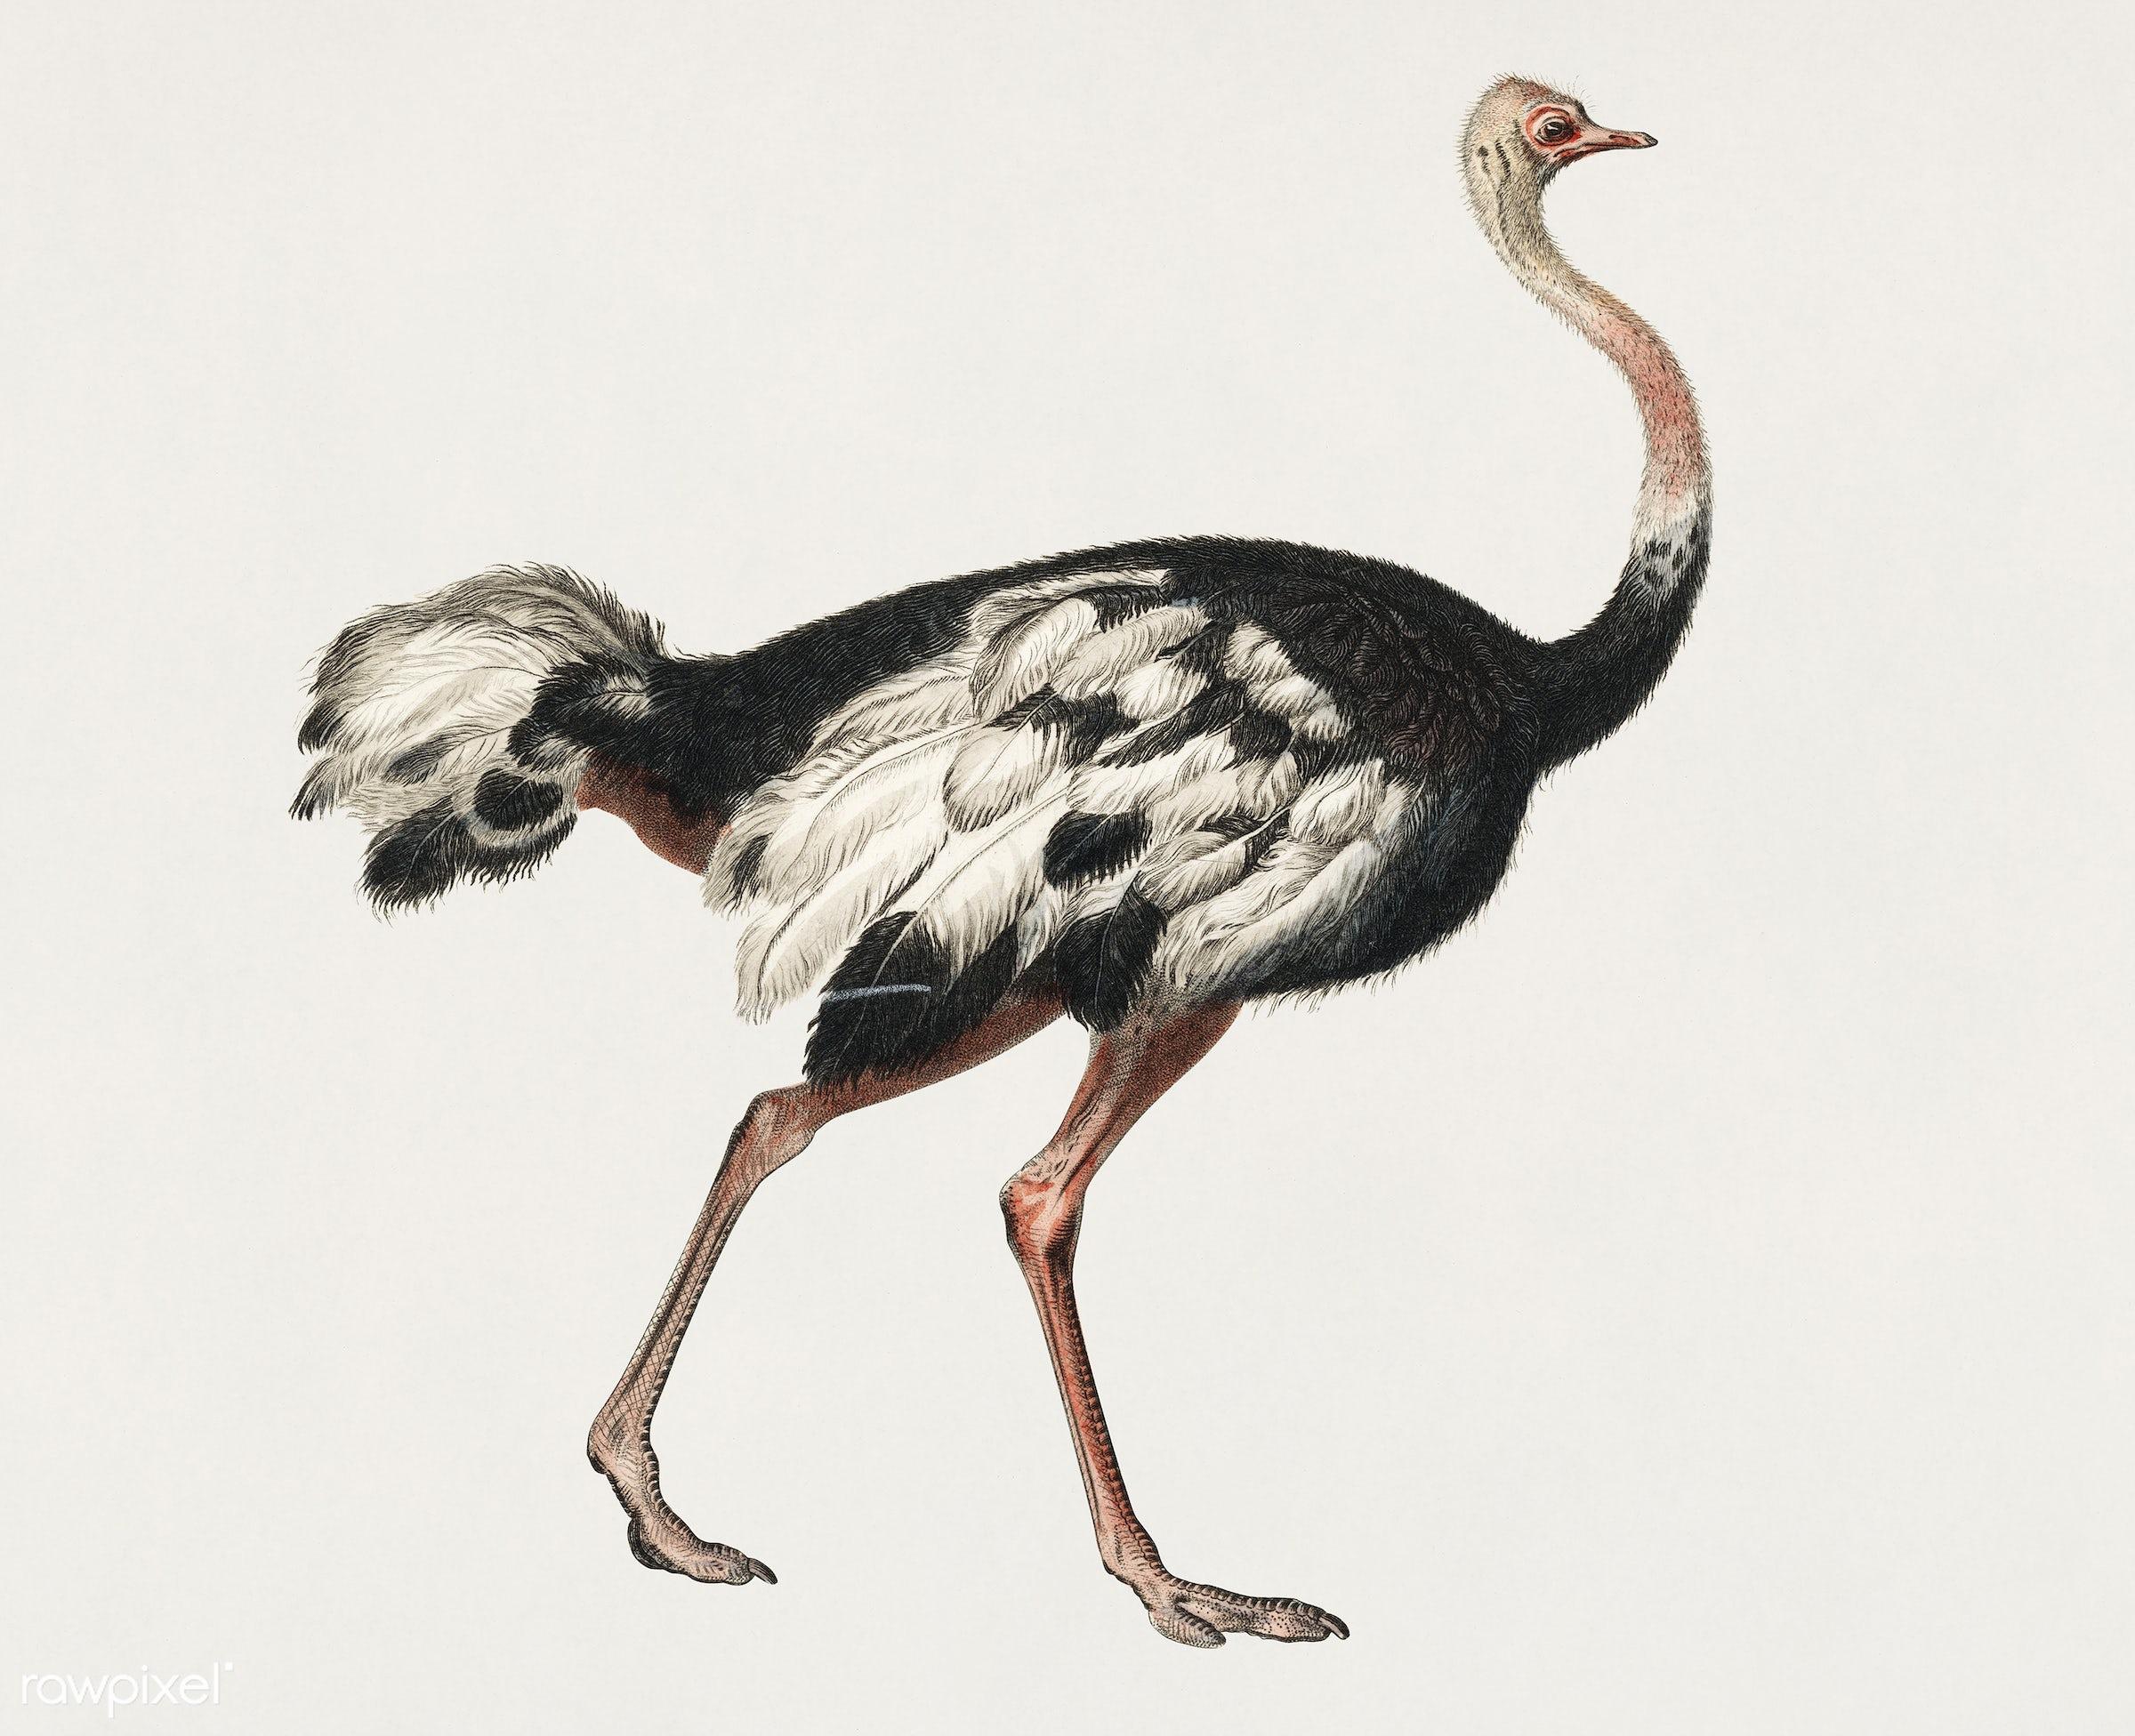 Vintage Illustration of Common ostrich (Struthio camelus) - bird, ostrich, ancient, animal, antique, artwork, autruche de...